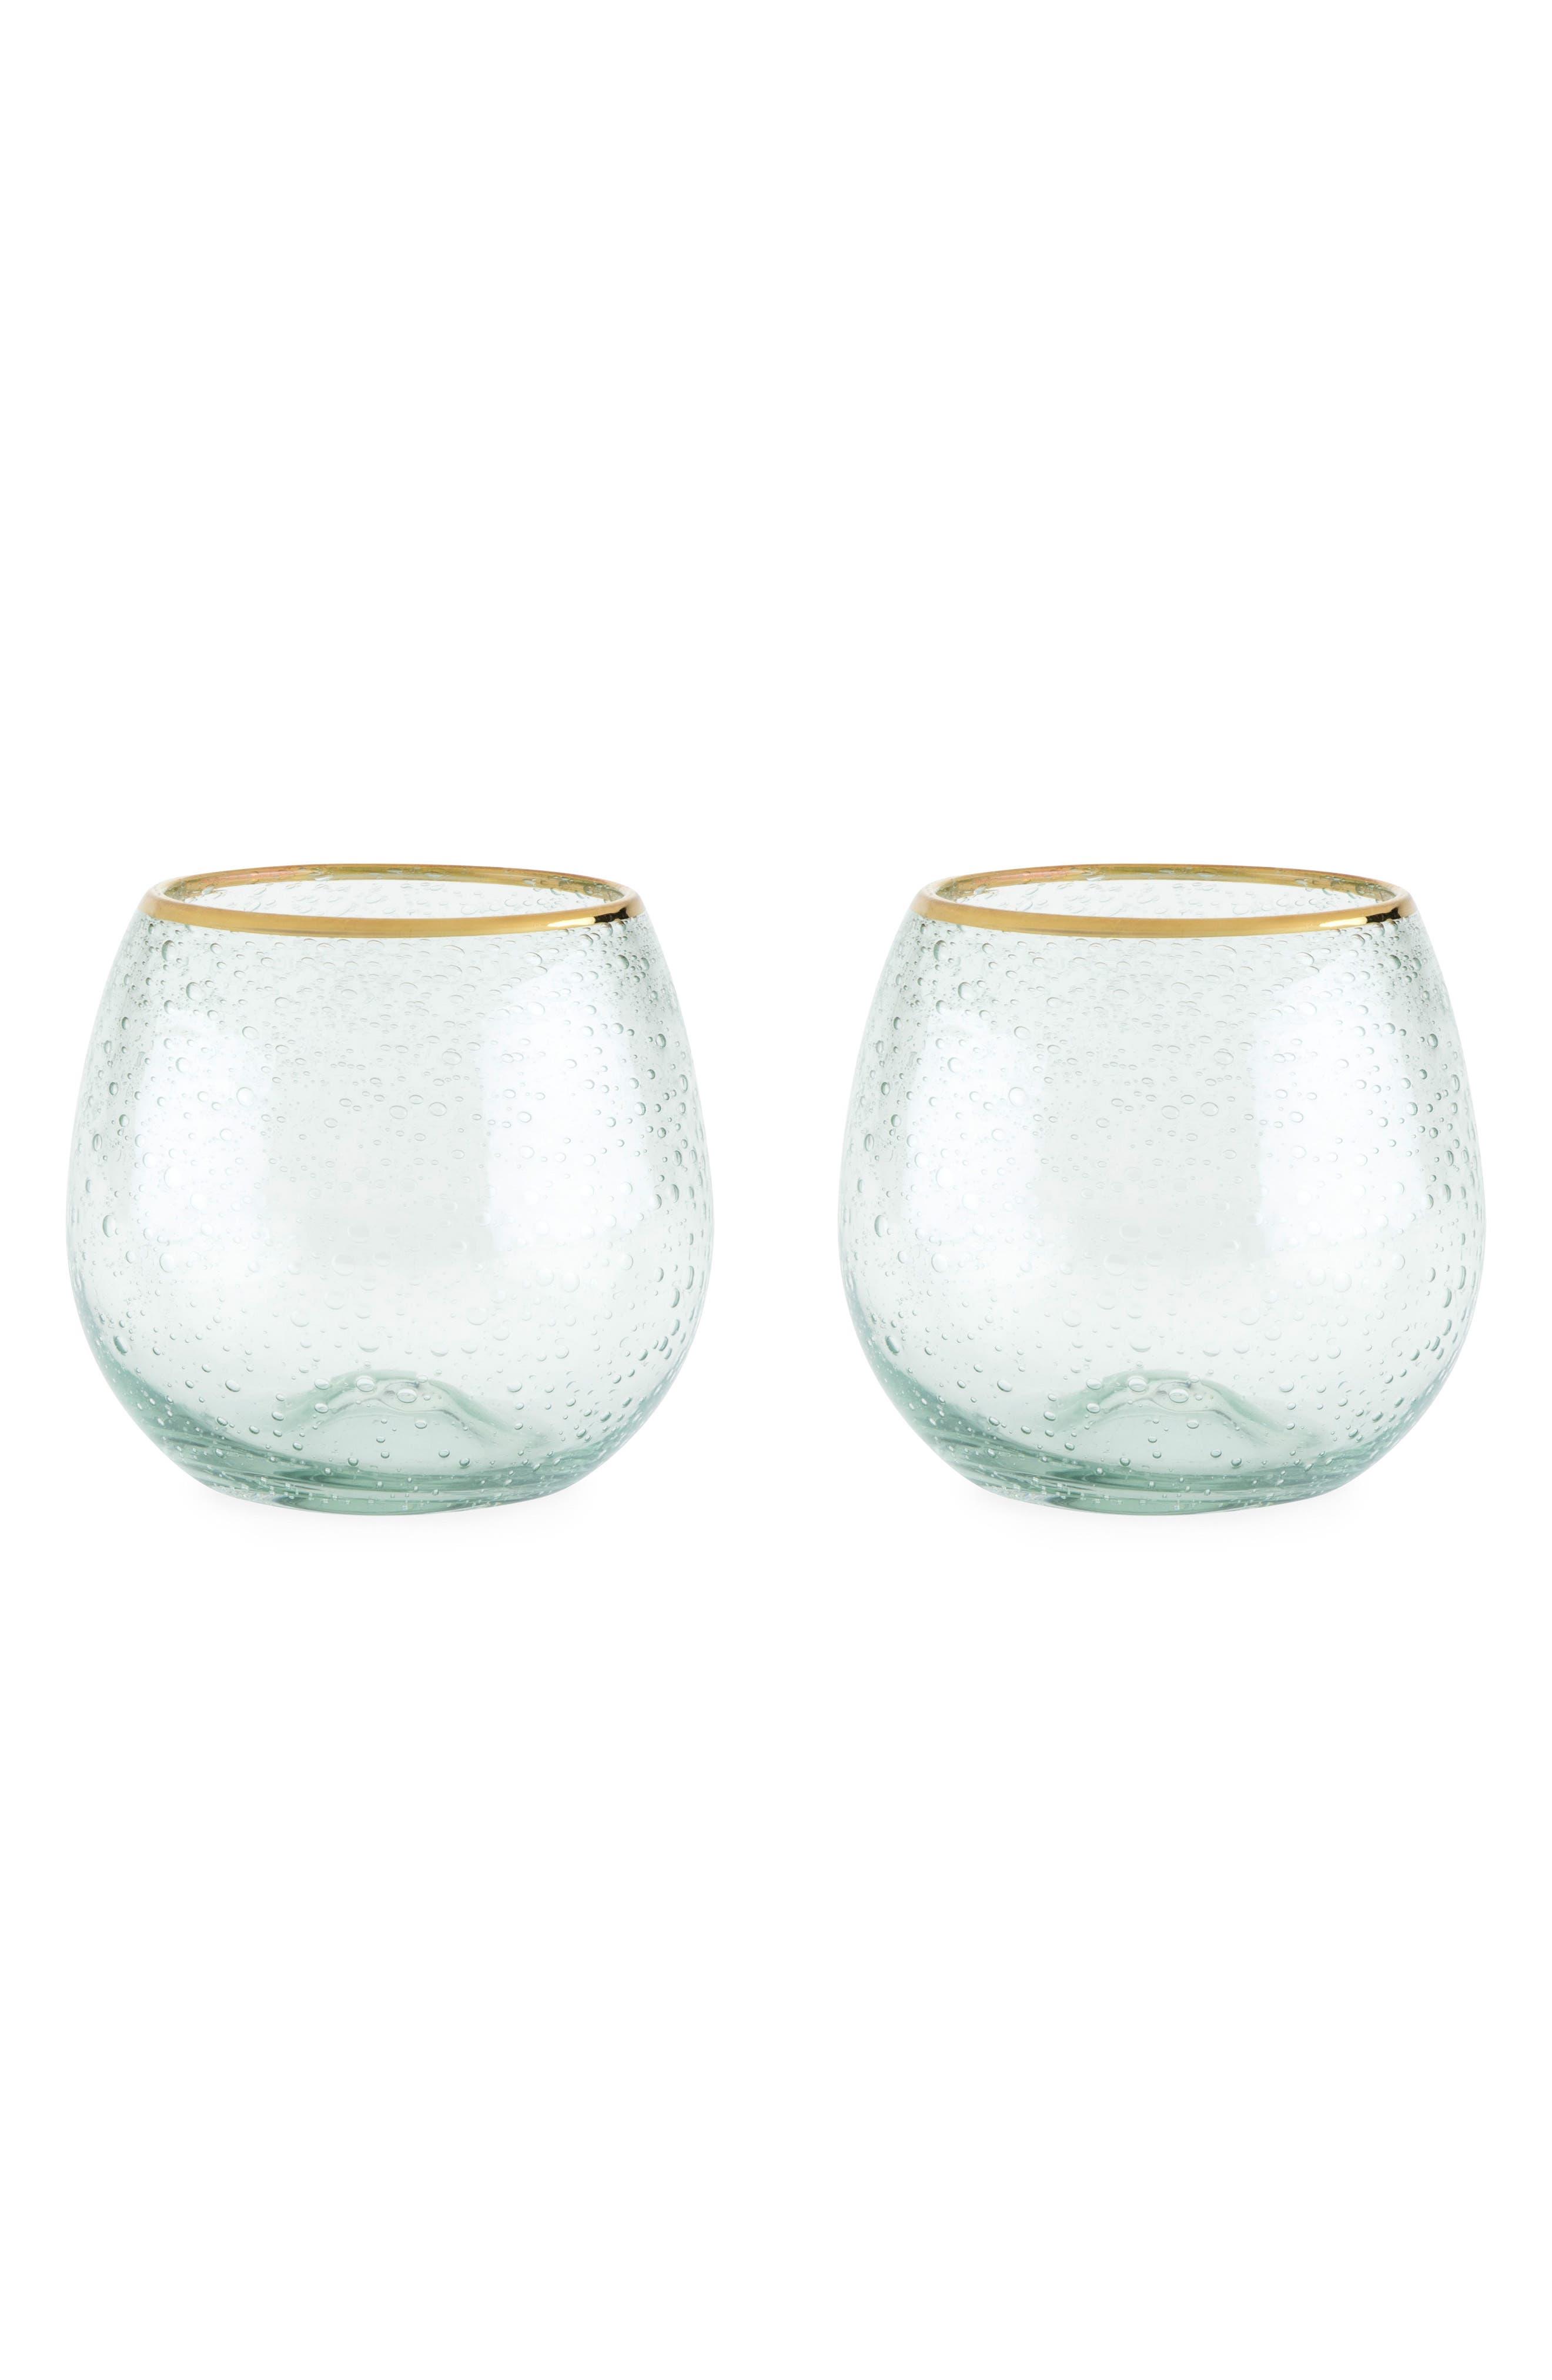 Set of 2 Gold Rim Stemless Wine Glasses,                         Main,                         color, 100